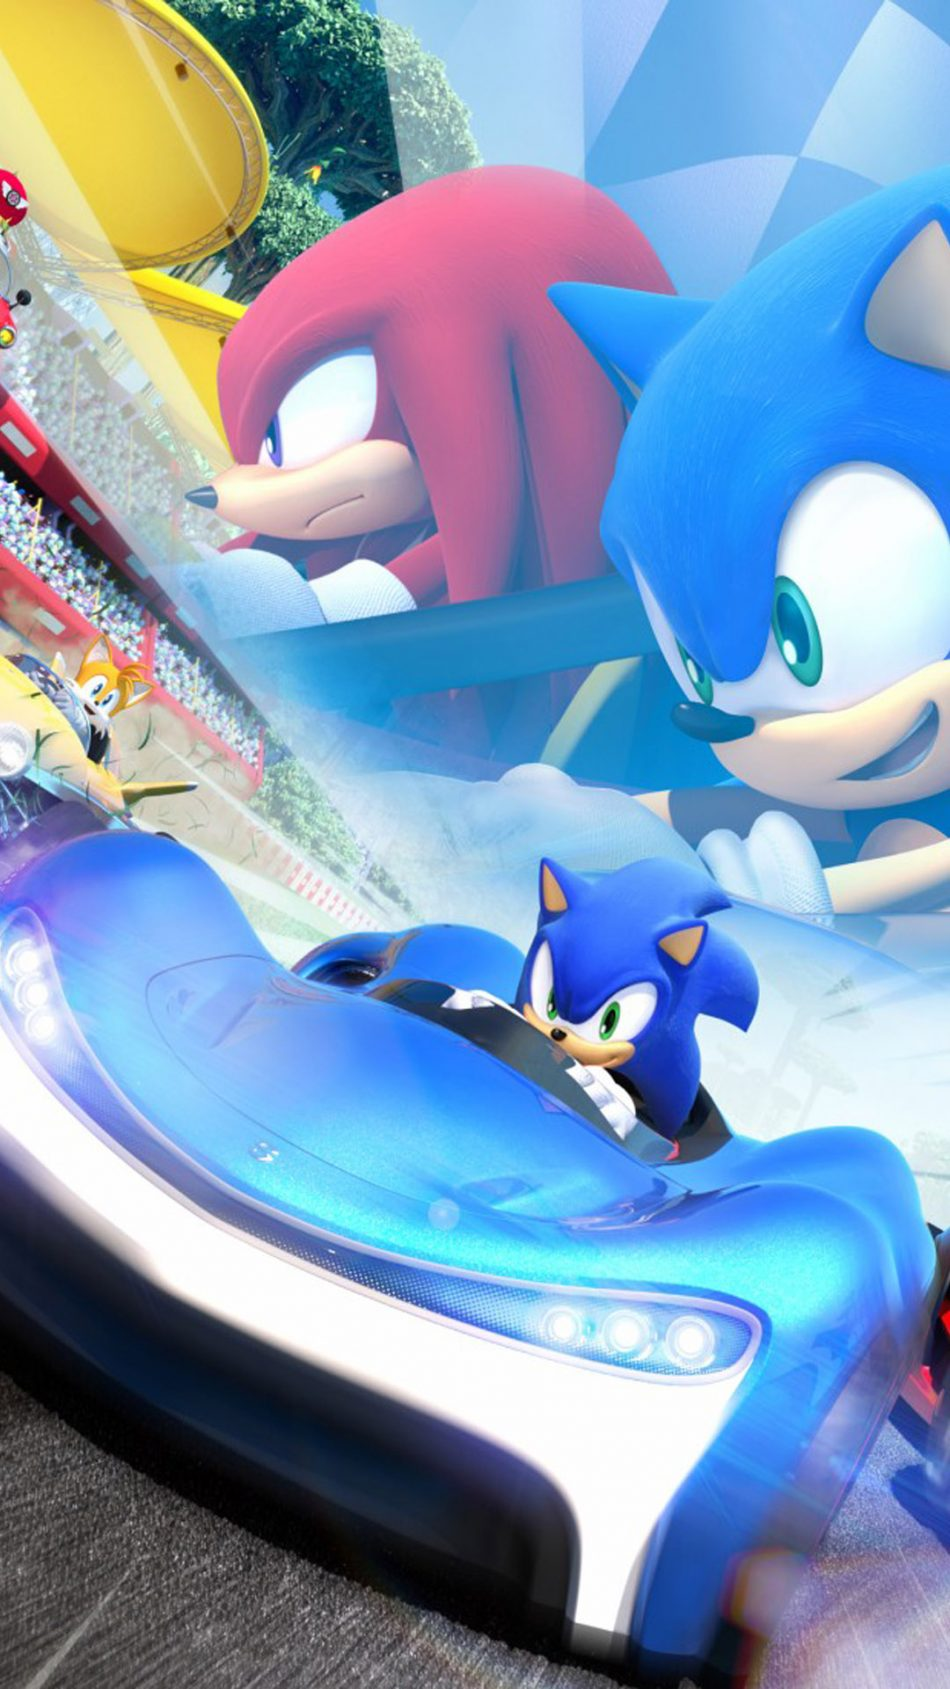 Team Sonic Racing HD Mobile Wallpaper